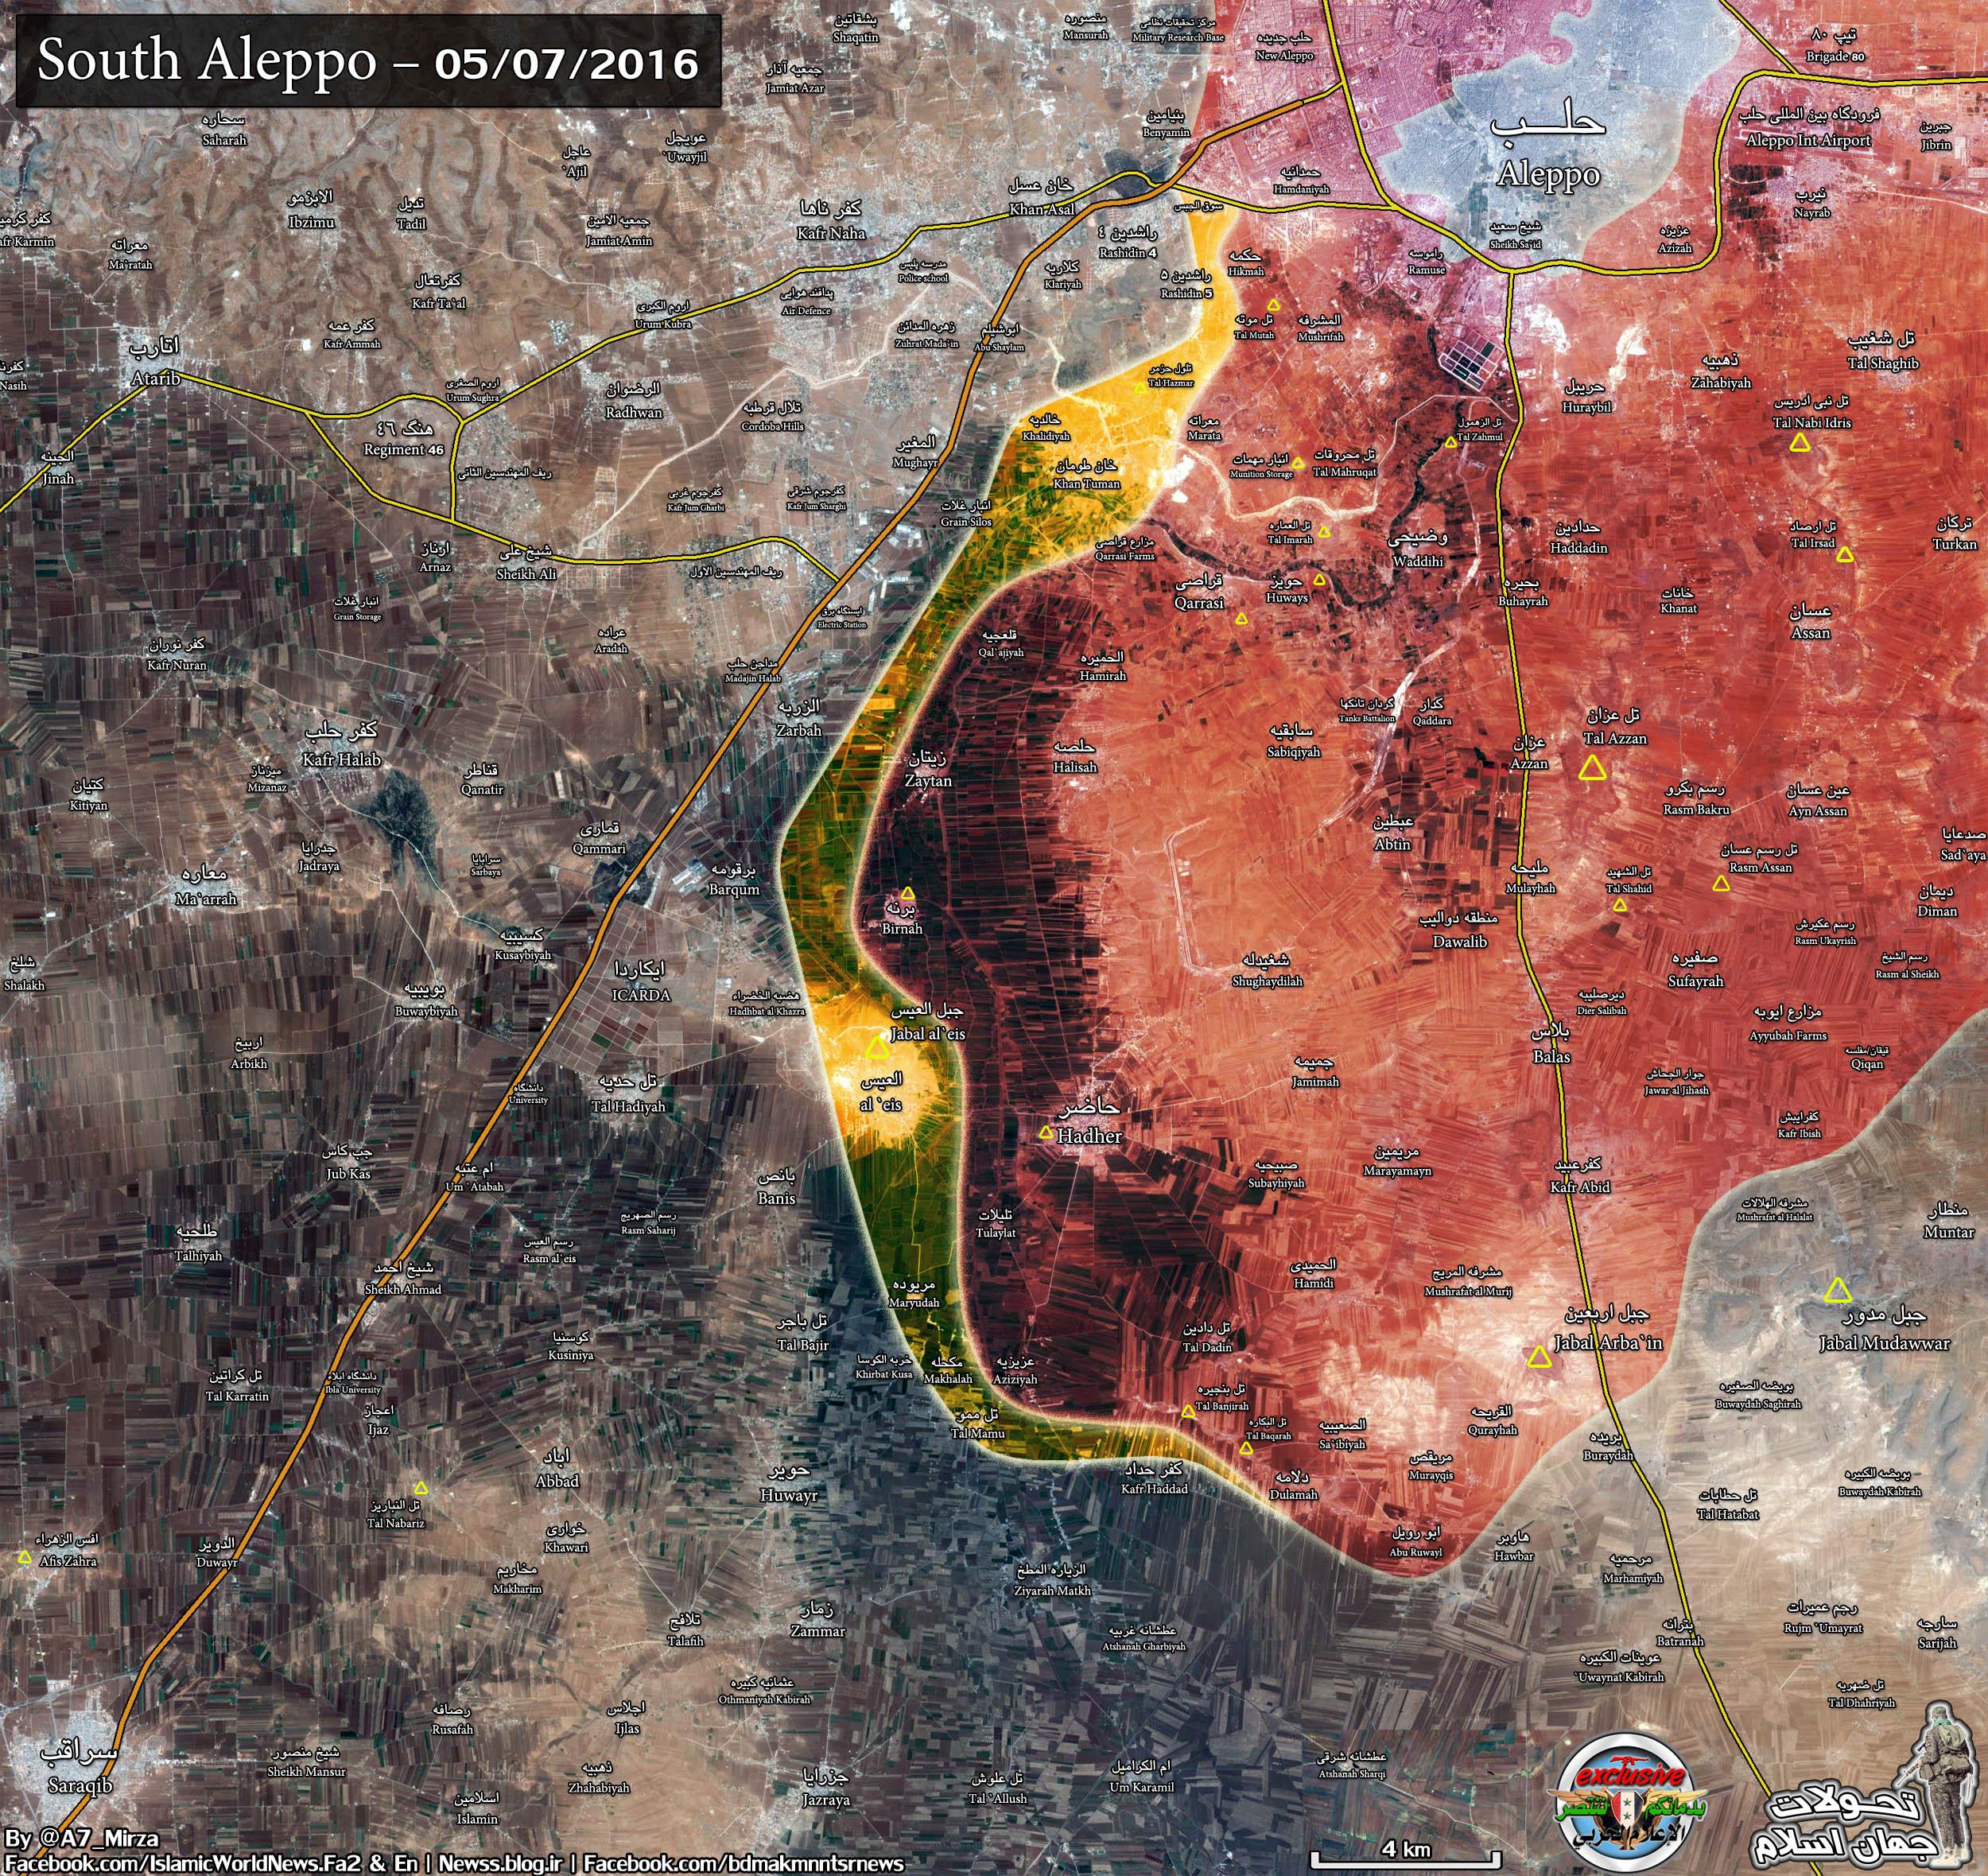 Syria: Heavy Clashes near Khan Touman in Aleppo Province